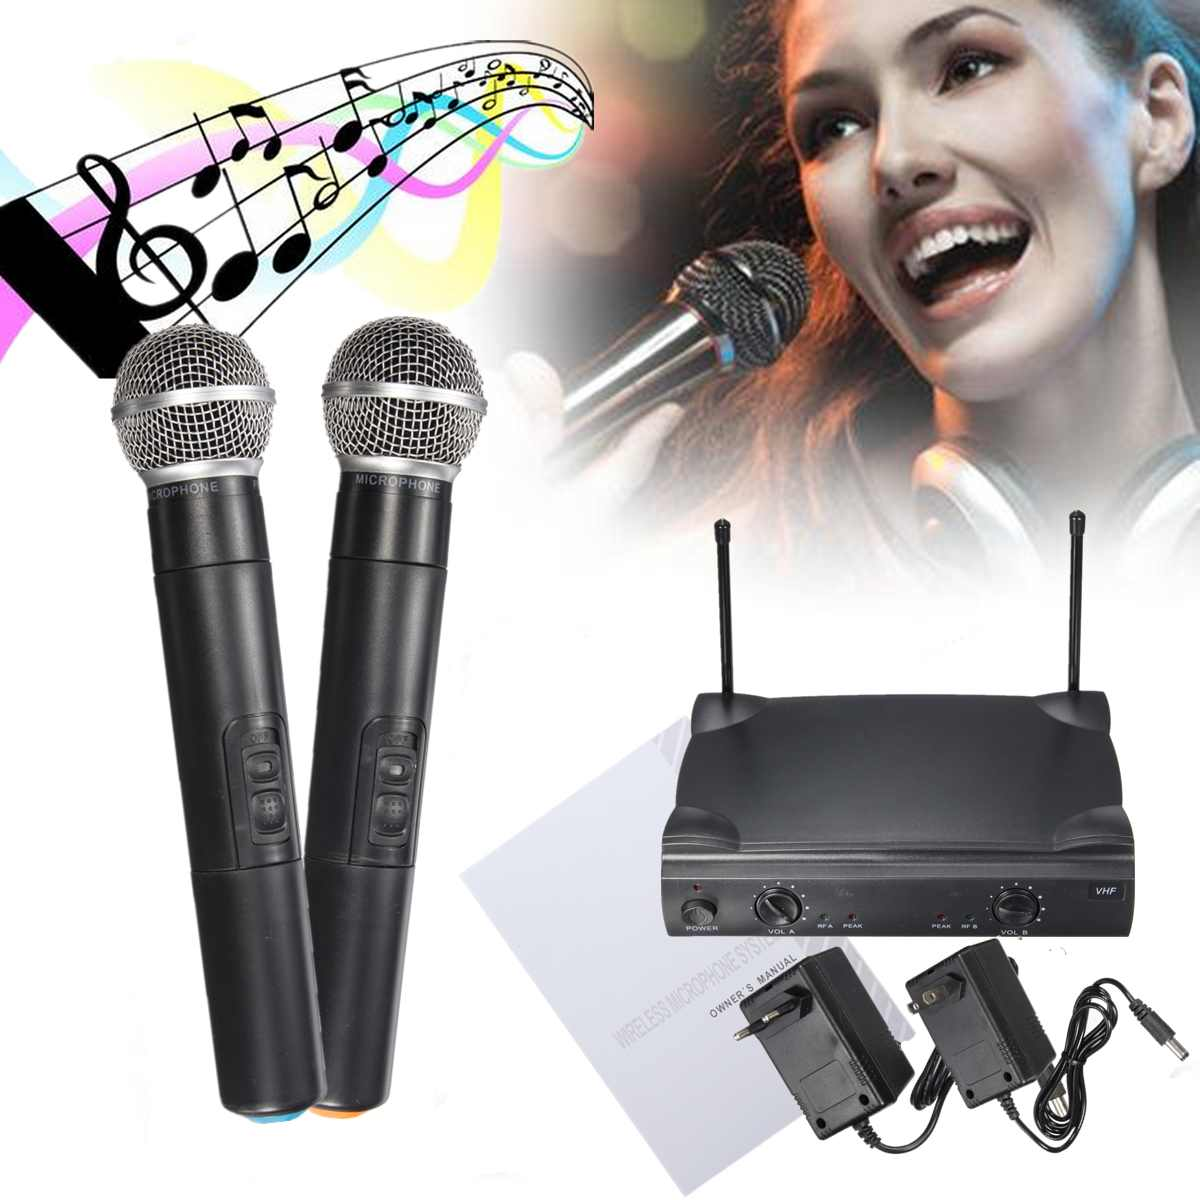 Sistema de micrófono inalámbrico de mano profesional VHF Dual con receptor para micrófono Kareoke fiesta estudio o karaoke ¡Oferta! micrófono de Karaoke para niños, juguete de aprendizaje de música fresco ajustable con efecto de luz, regalo de cumpleaños para niños, azul/rosa